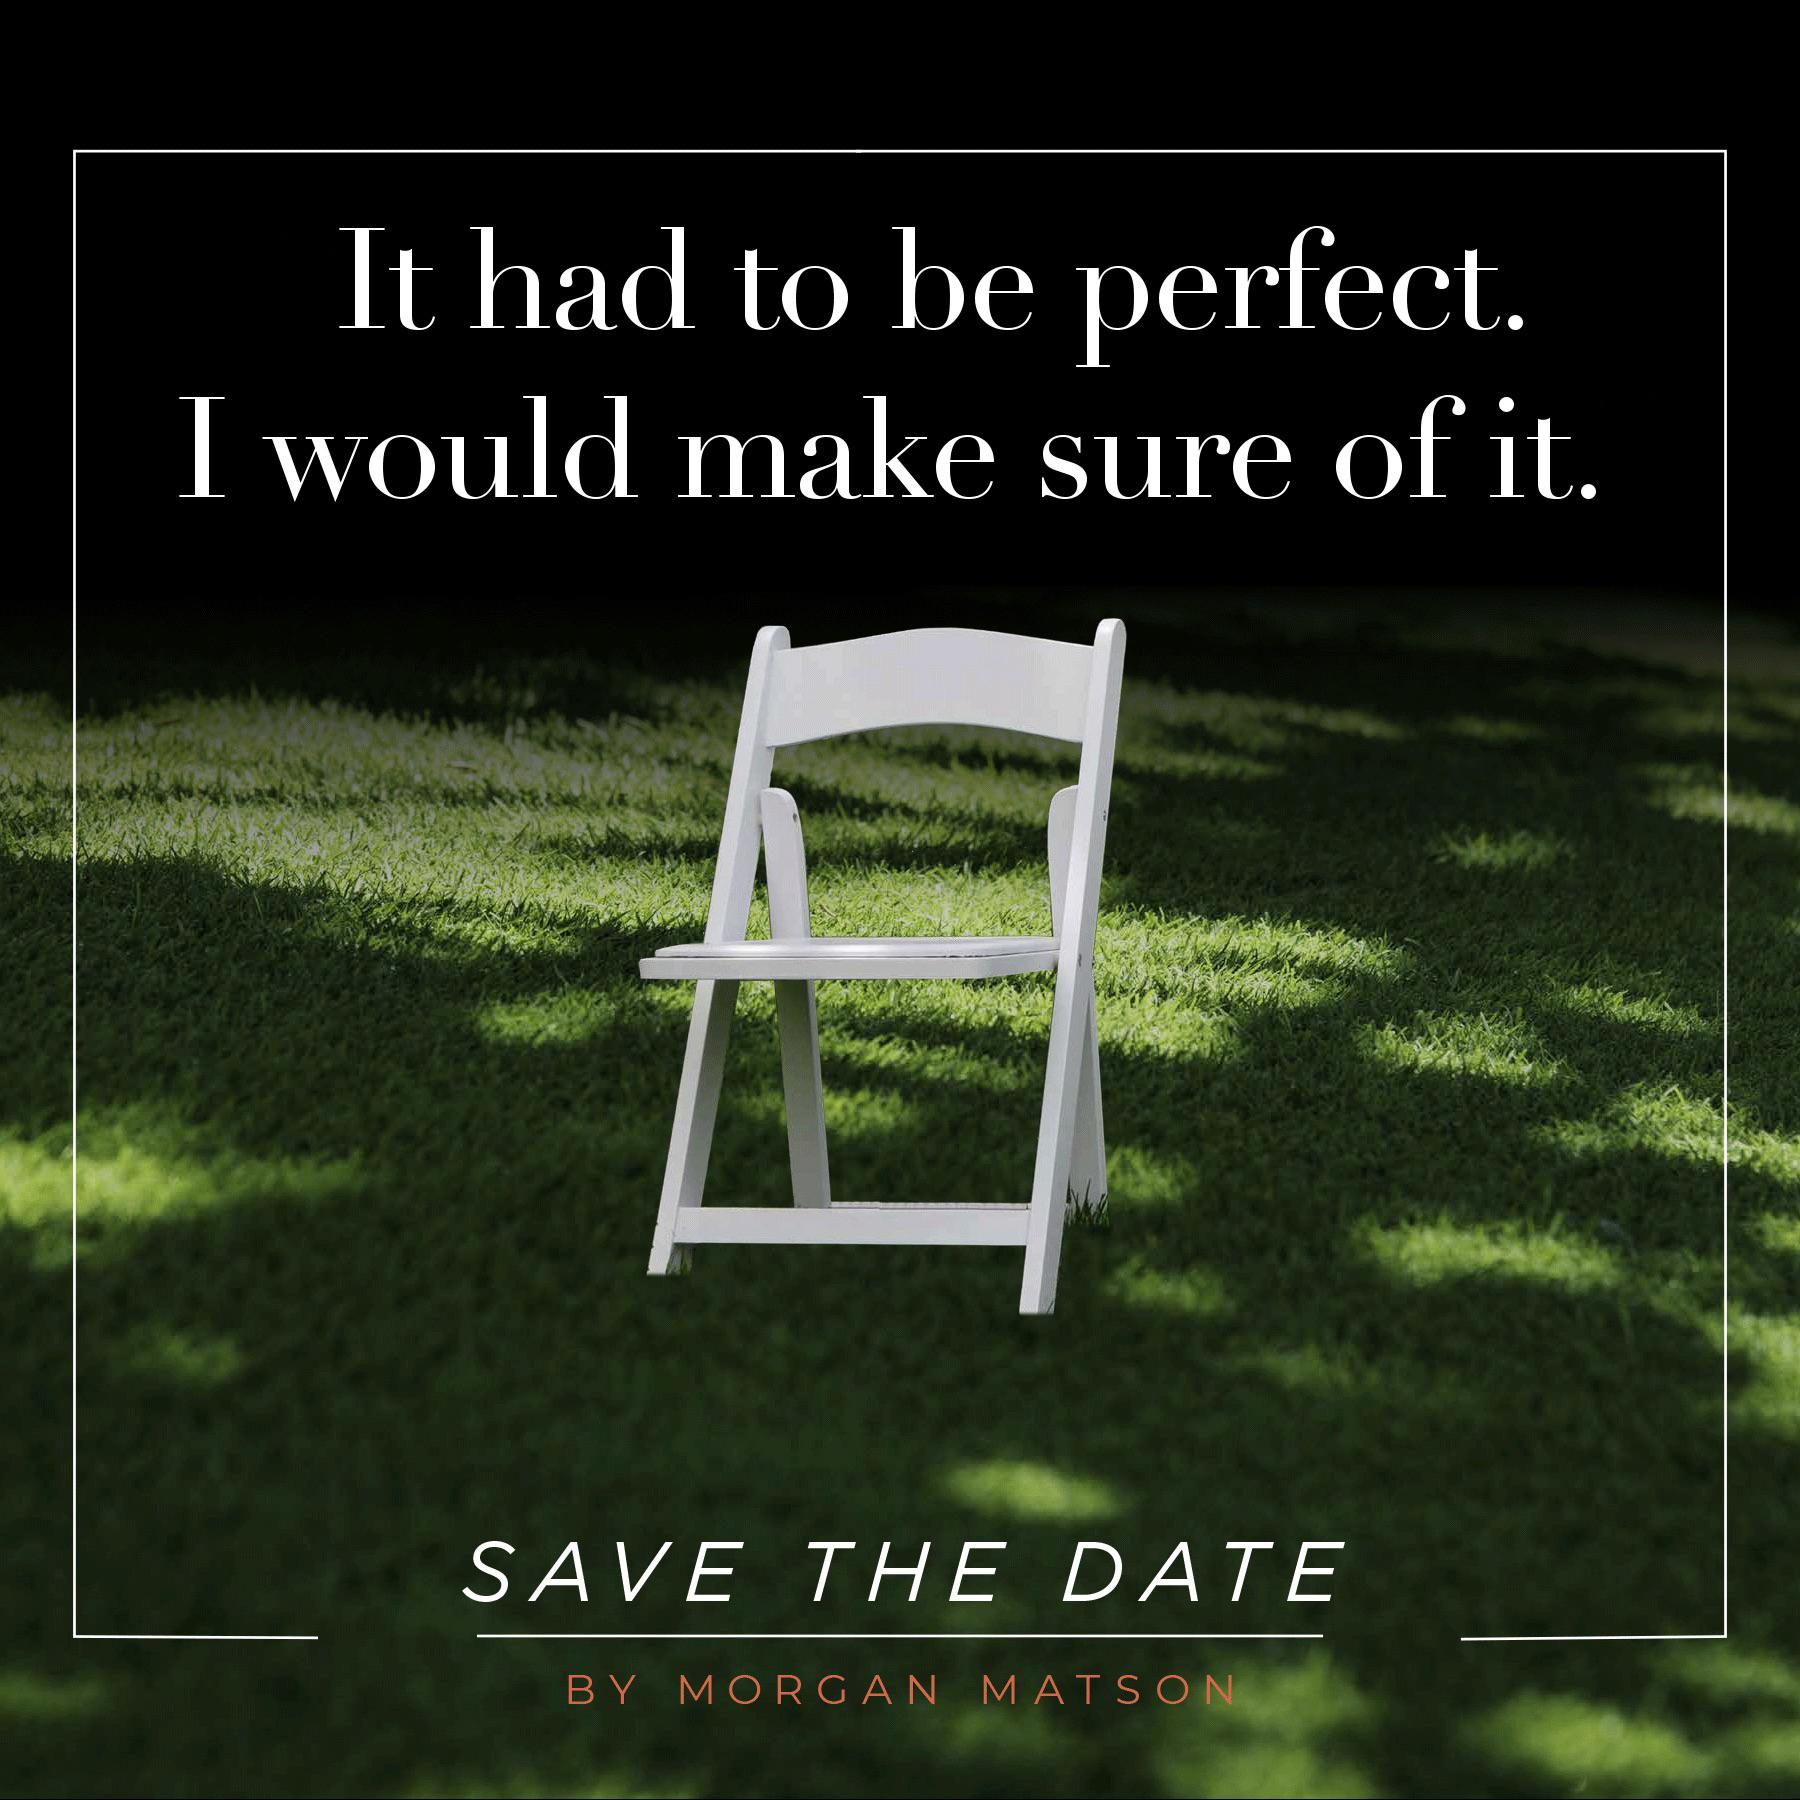 Amazon.com: Save the Date eBook: Morgan Matson: Kindle Store